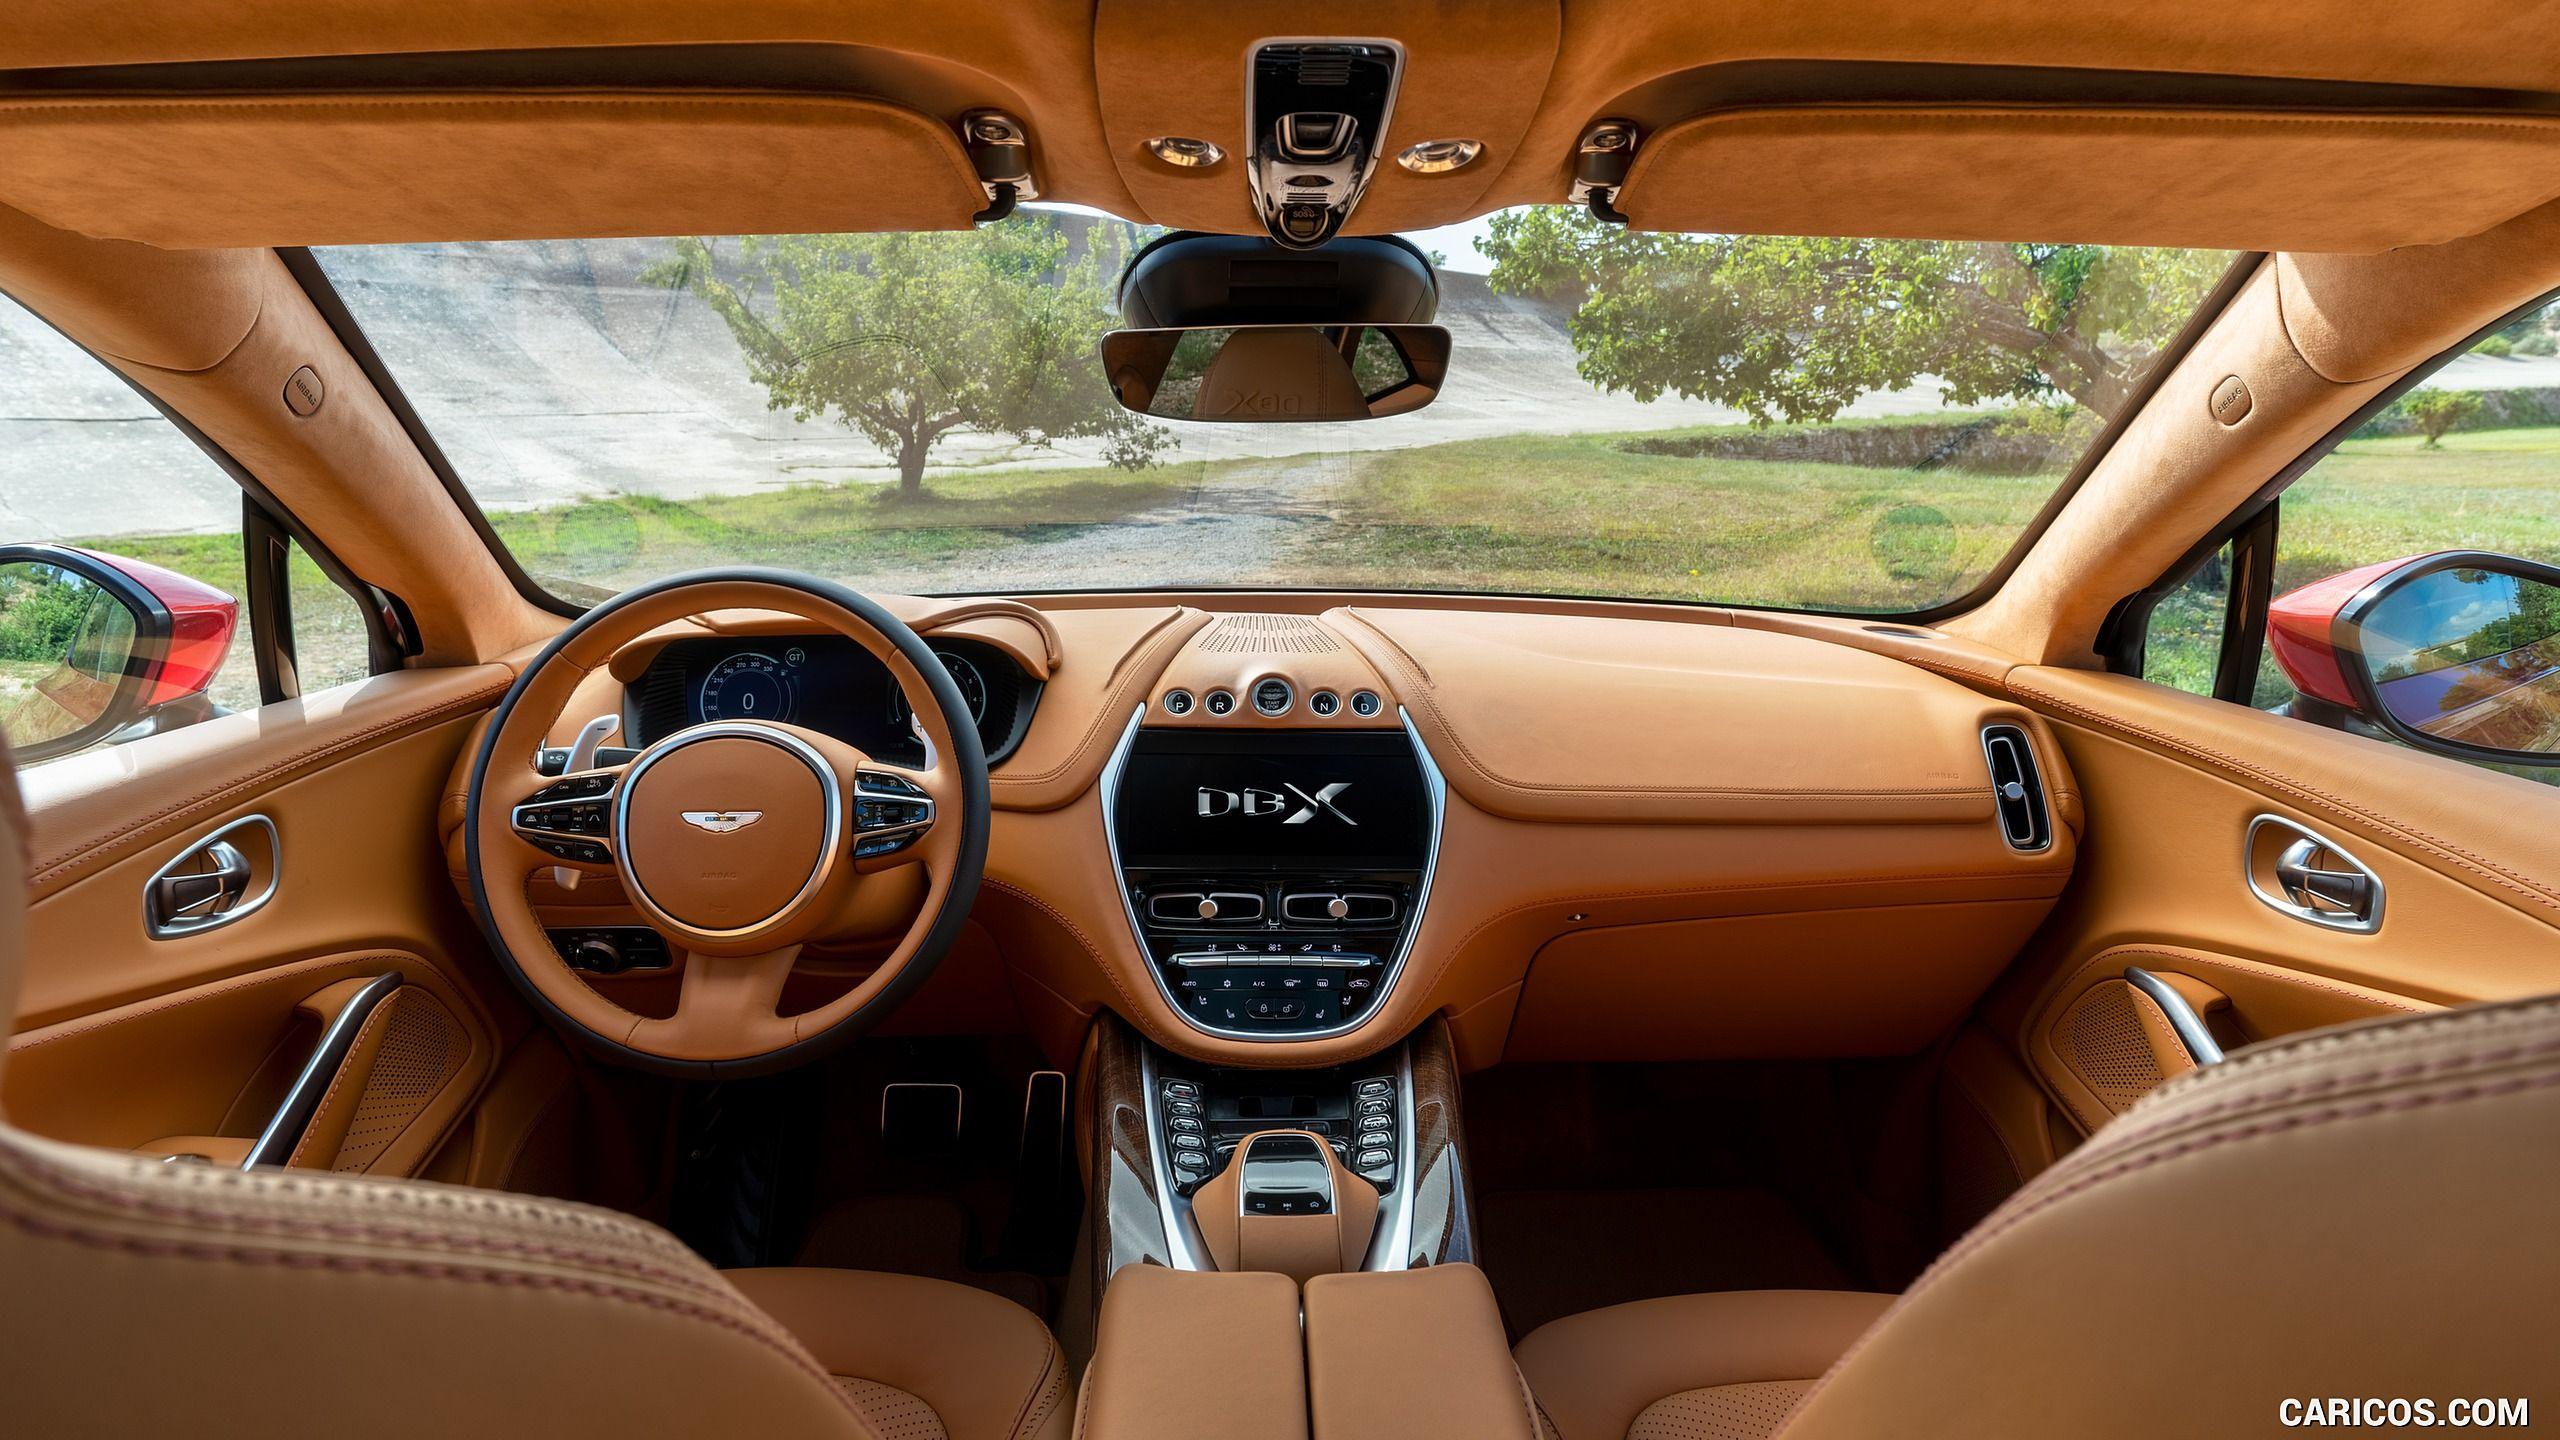 2021 Aston Martin Dbx Interior Cockpit Hd Aston Martin Interior Aston Martin Lagonda Aston Martin